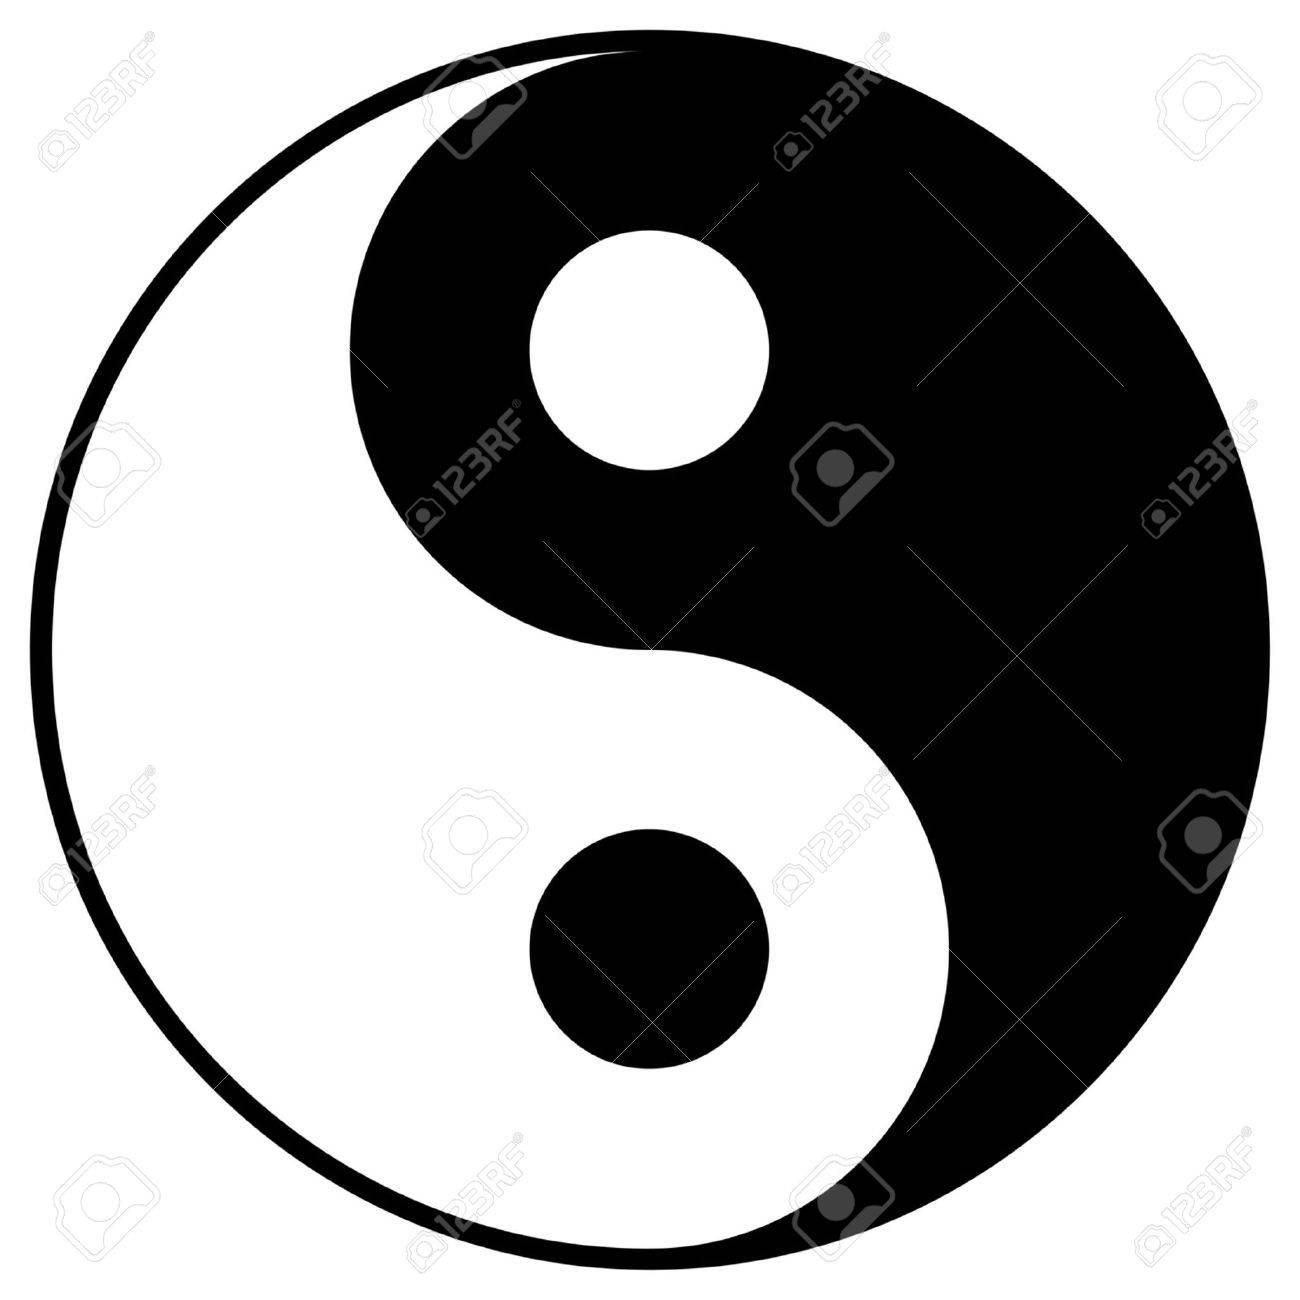 Yin and Yang symbol isolated over white background - 4675890